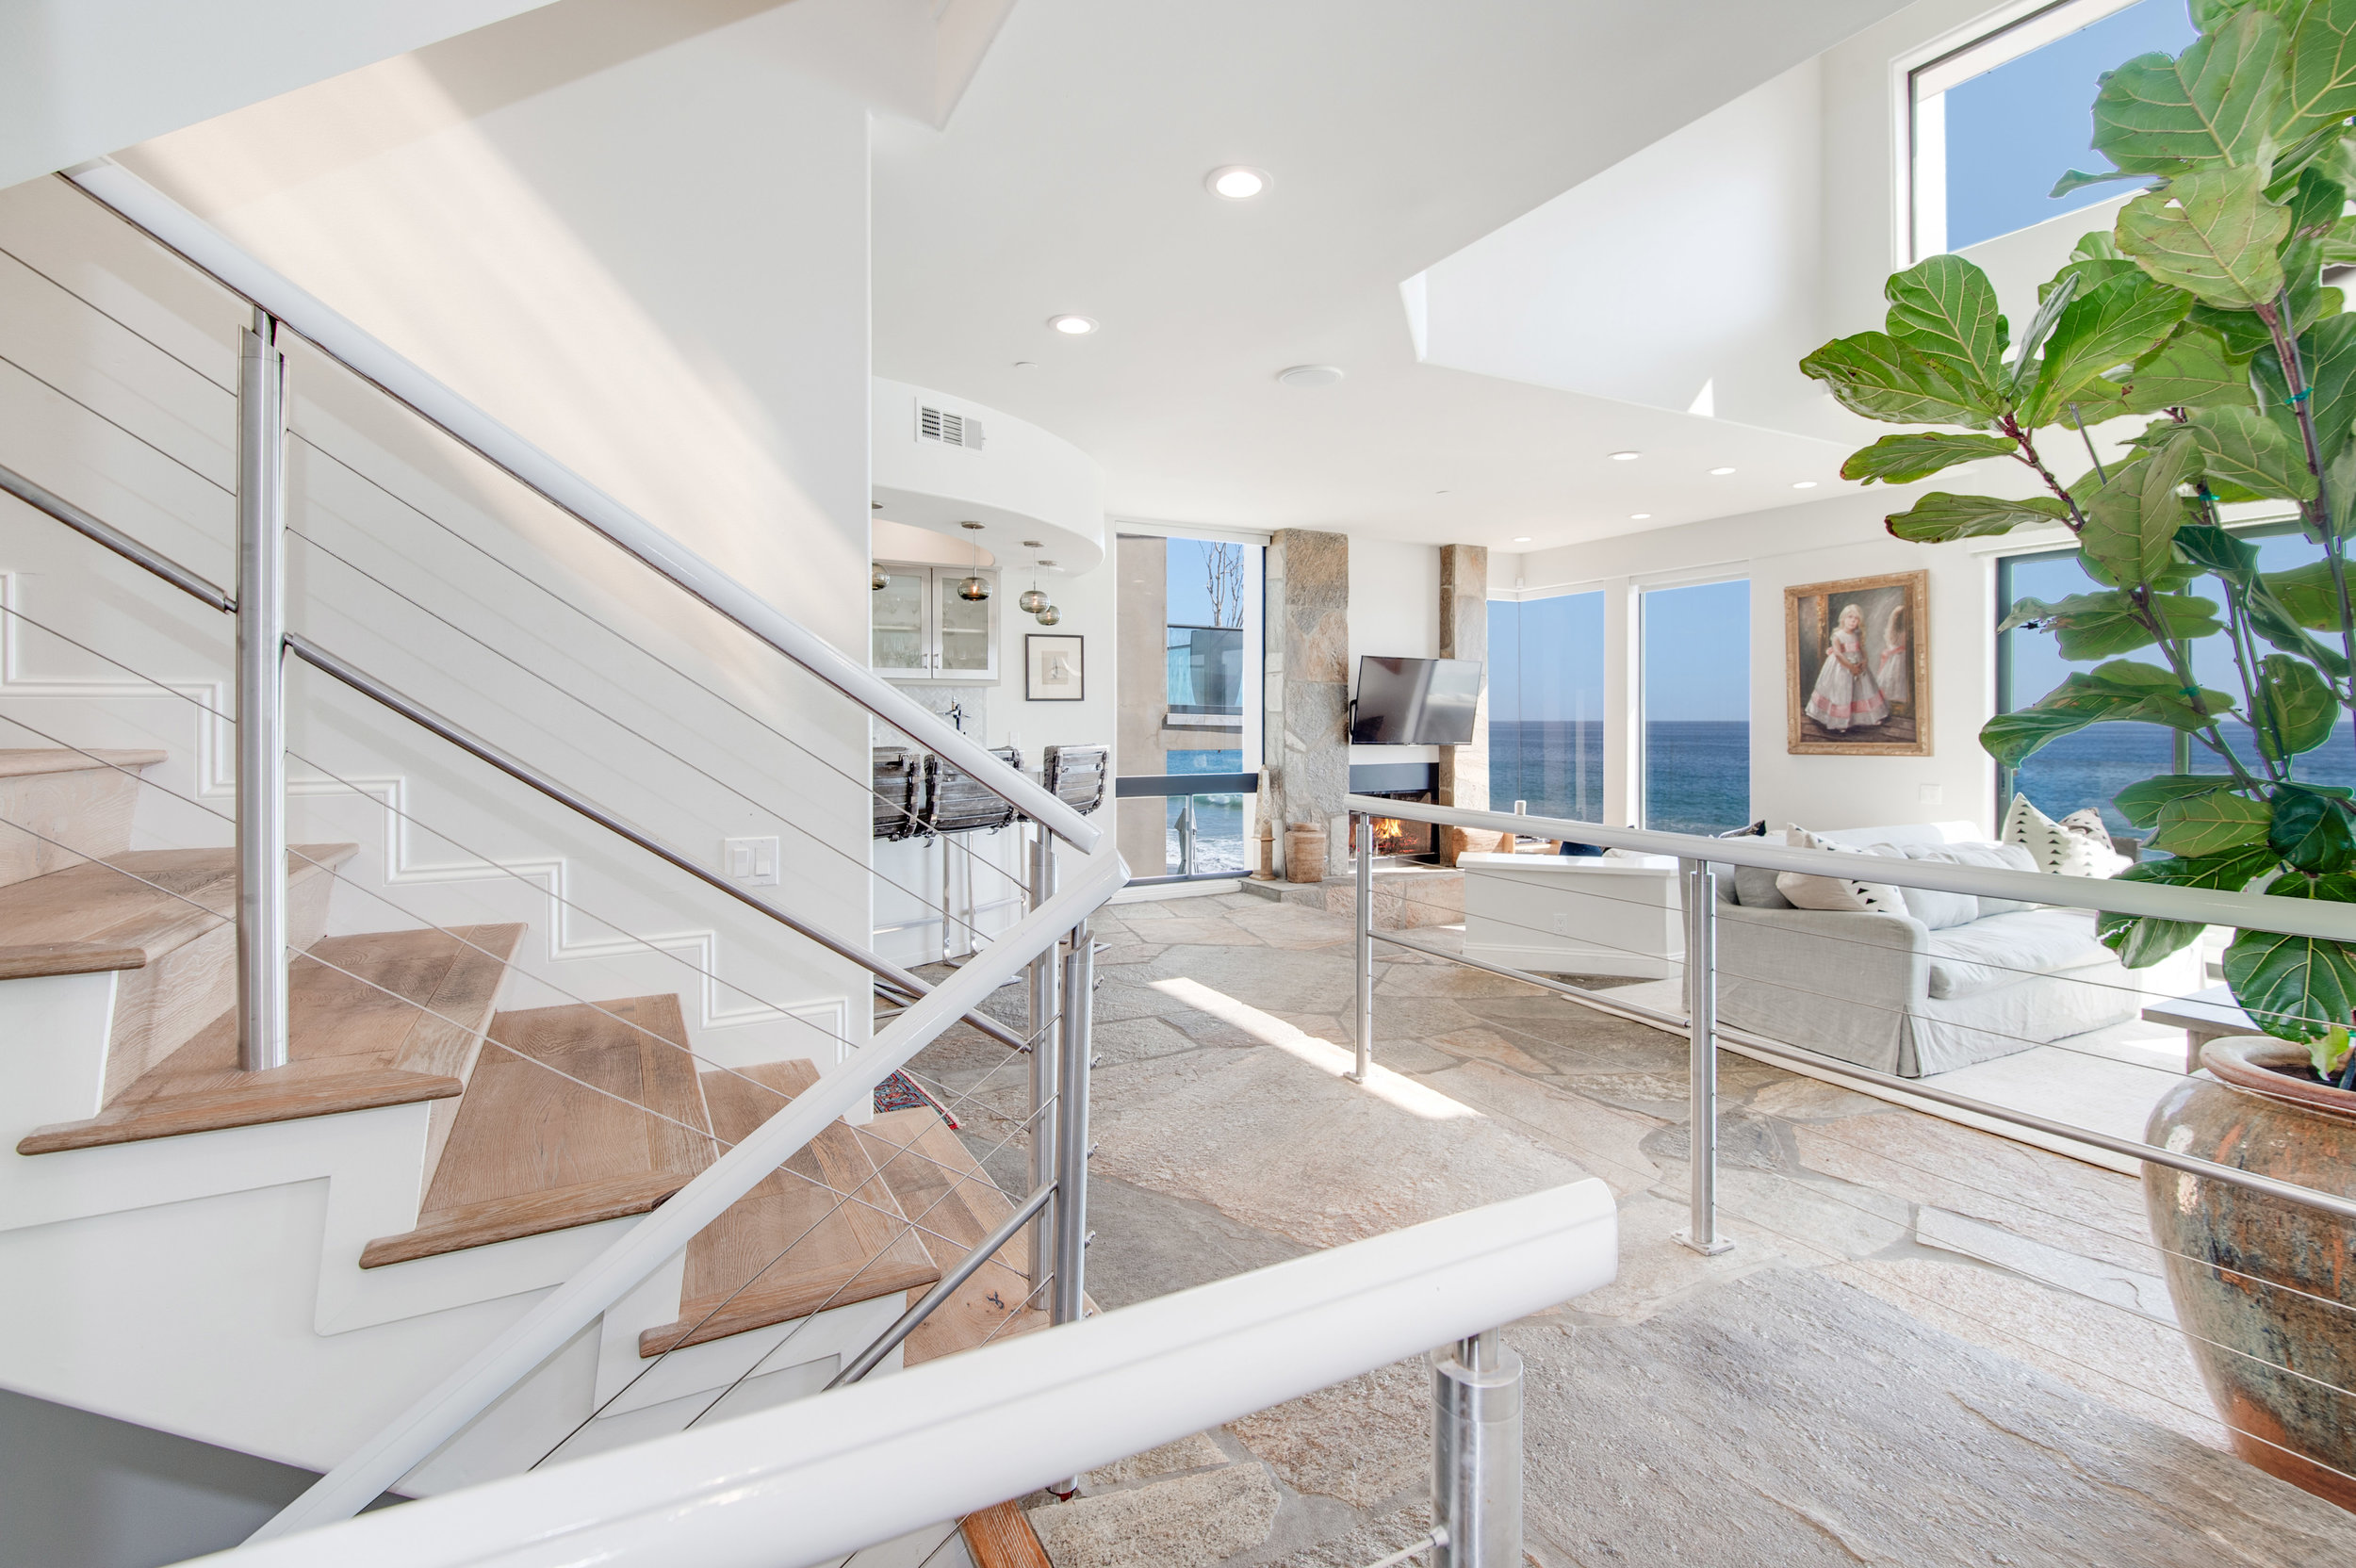 009 Stairs 25252 Malibu Road For Sale Lease The Malibu Life Team Luxury Real Estate.jpg